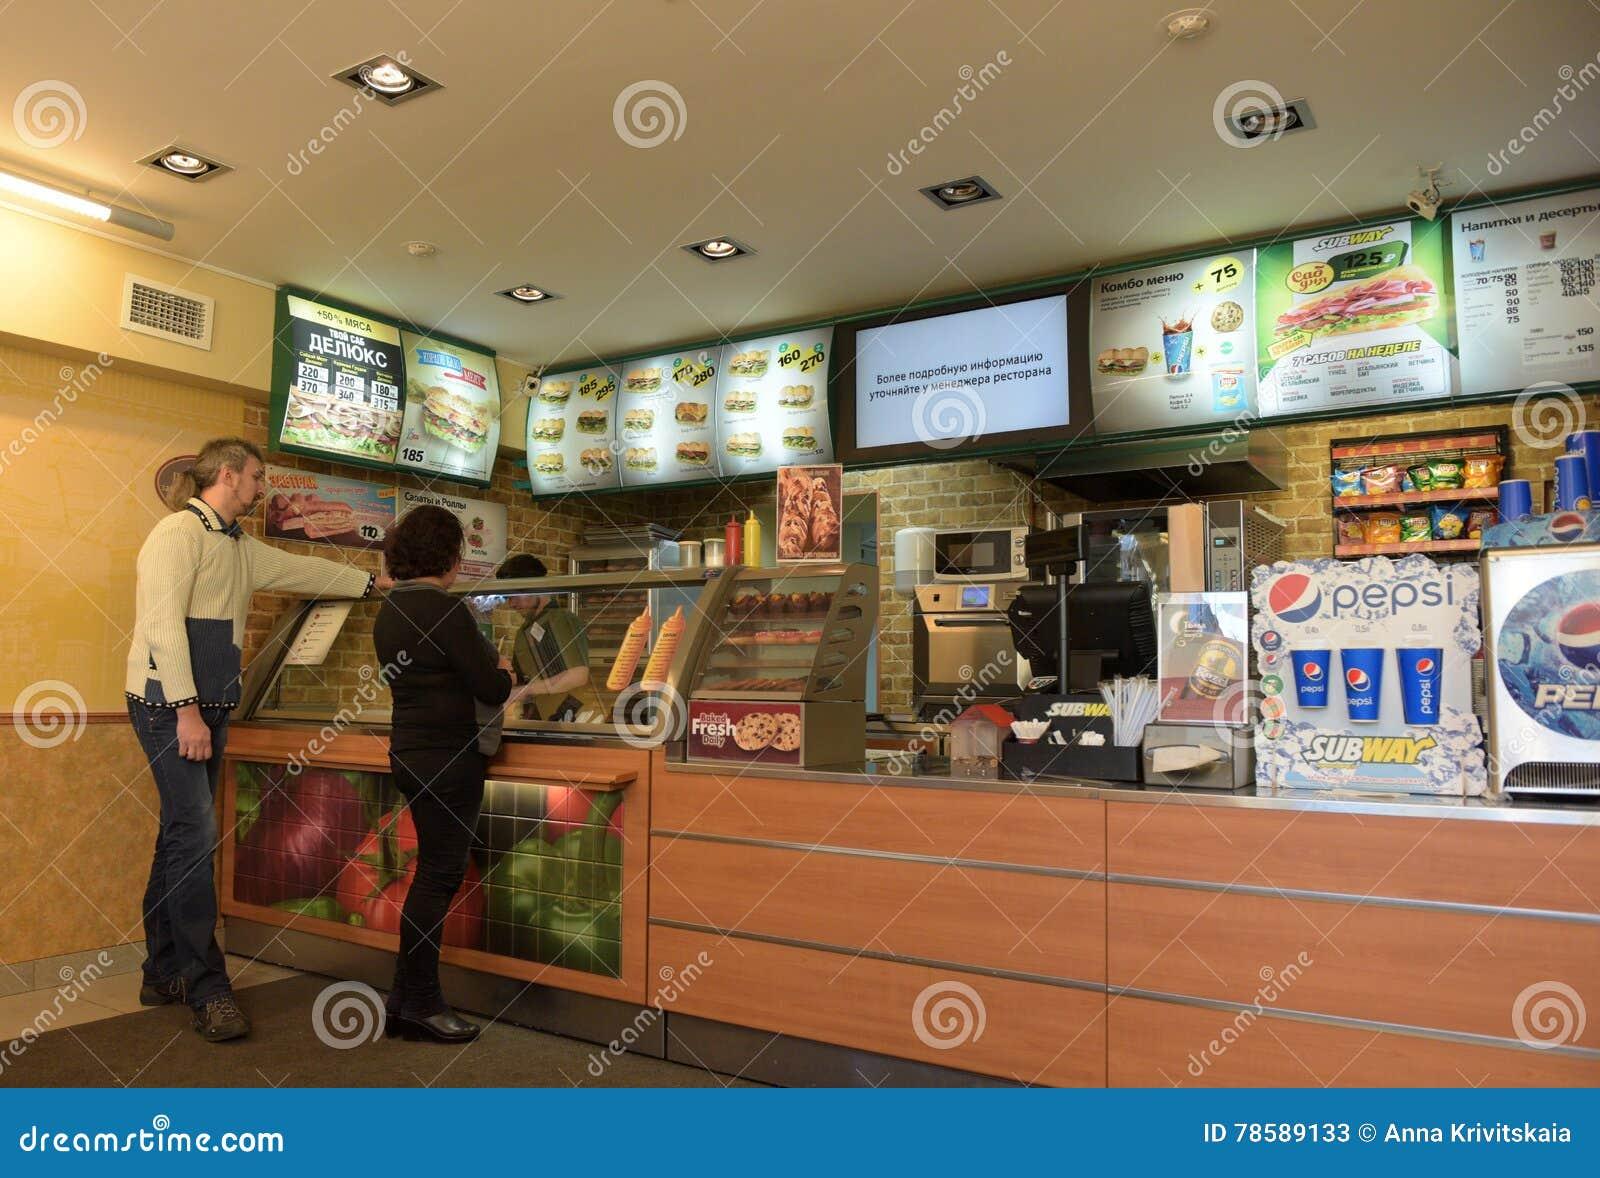 Subway Restaurant Editorial Stock Photo Image Of Large